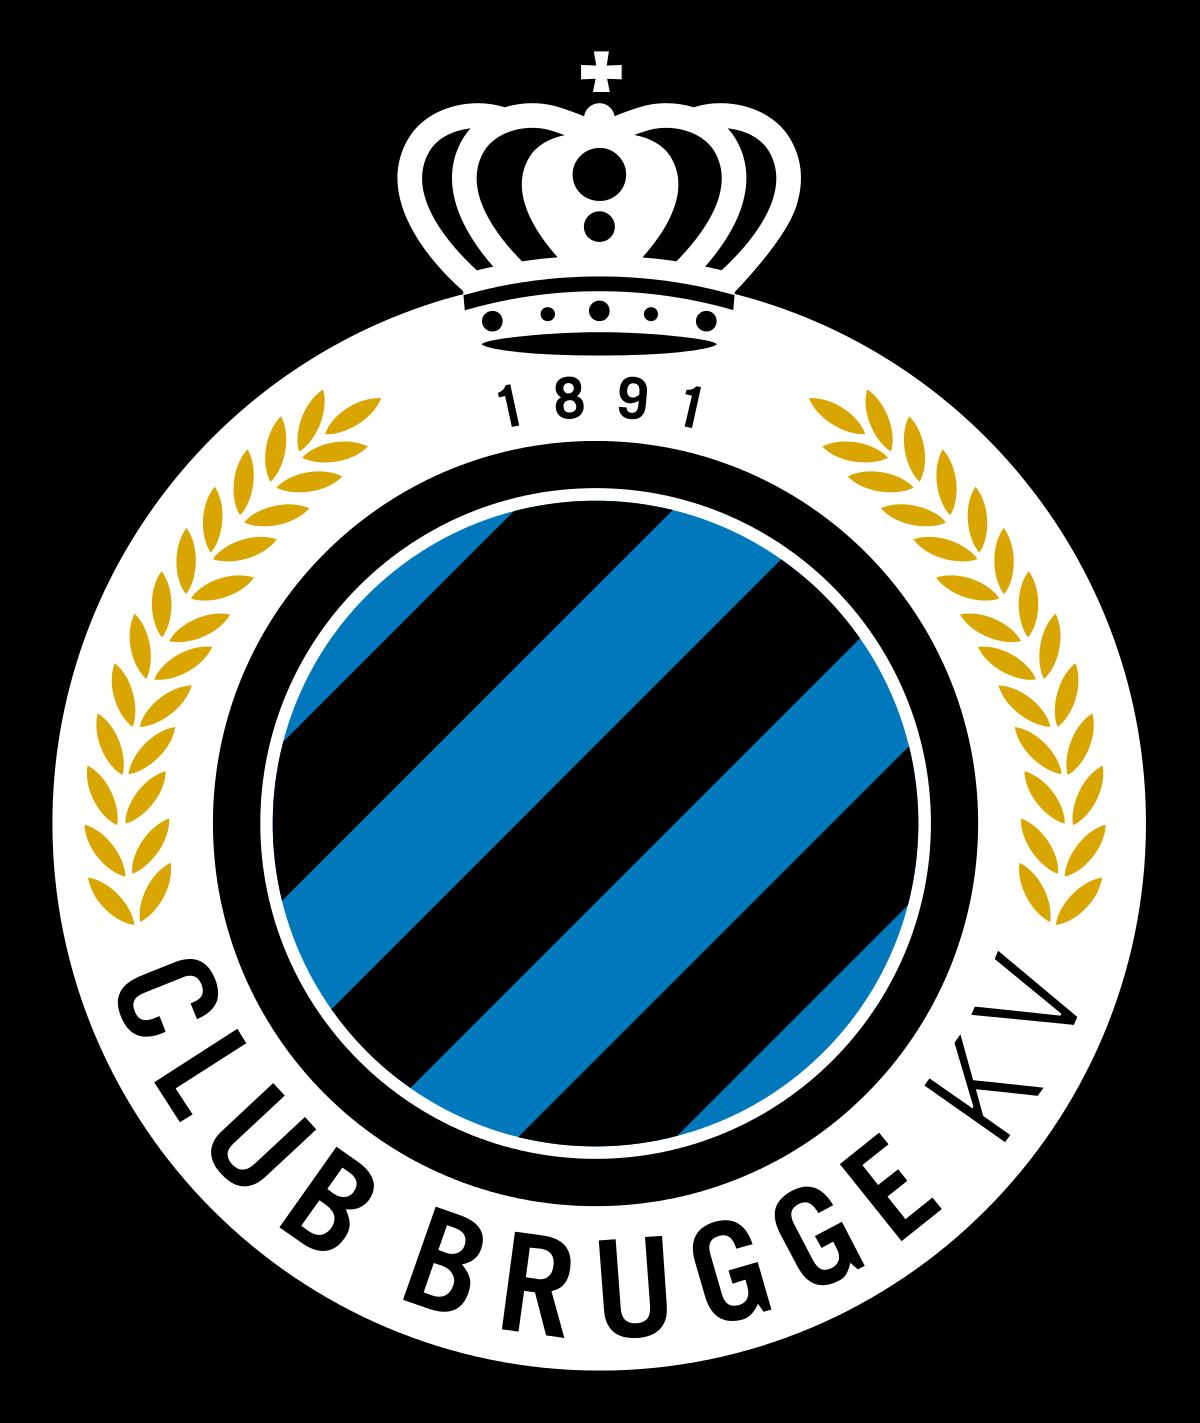 Club Brugge Logo 2019 20 Uefa Champions League Brugge Football Logo Football Team Logos